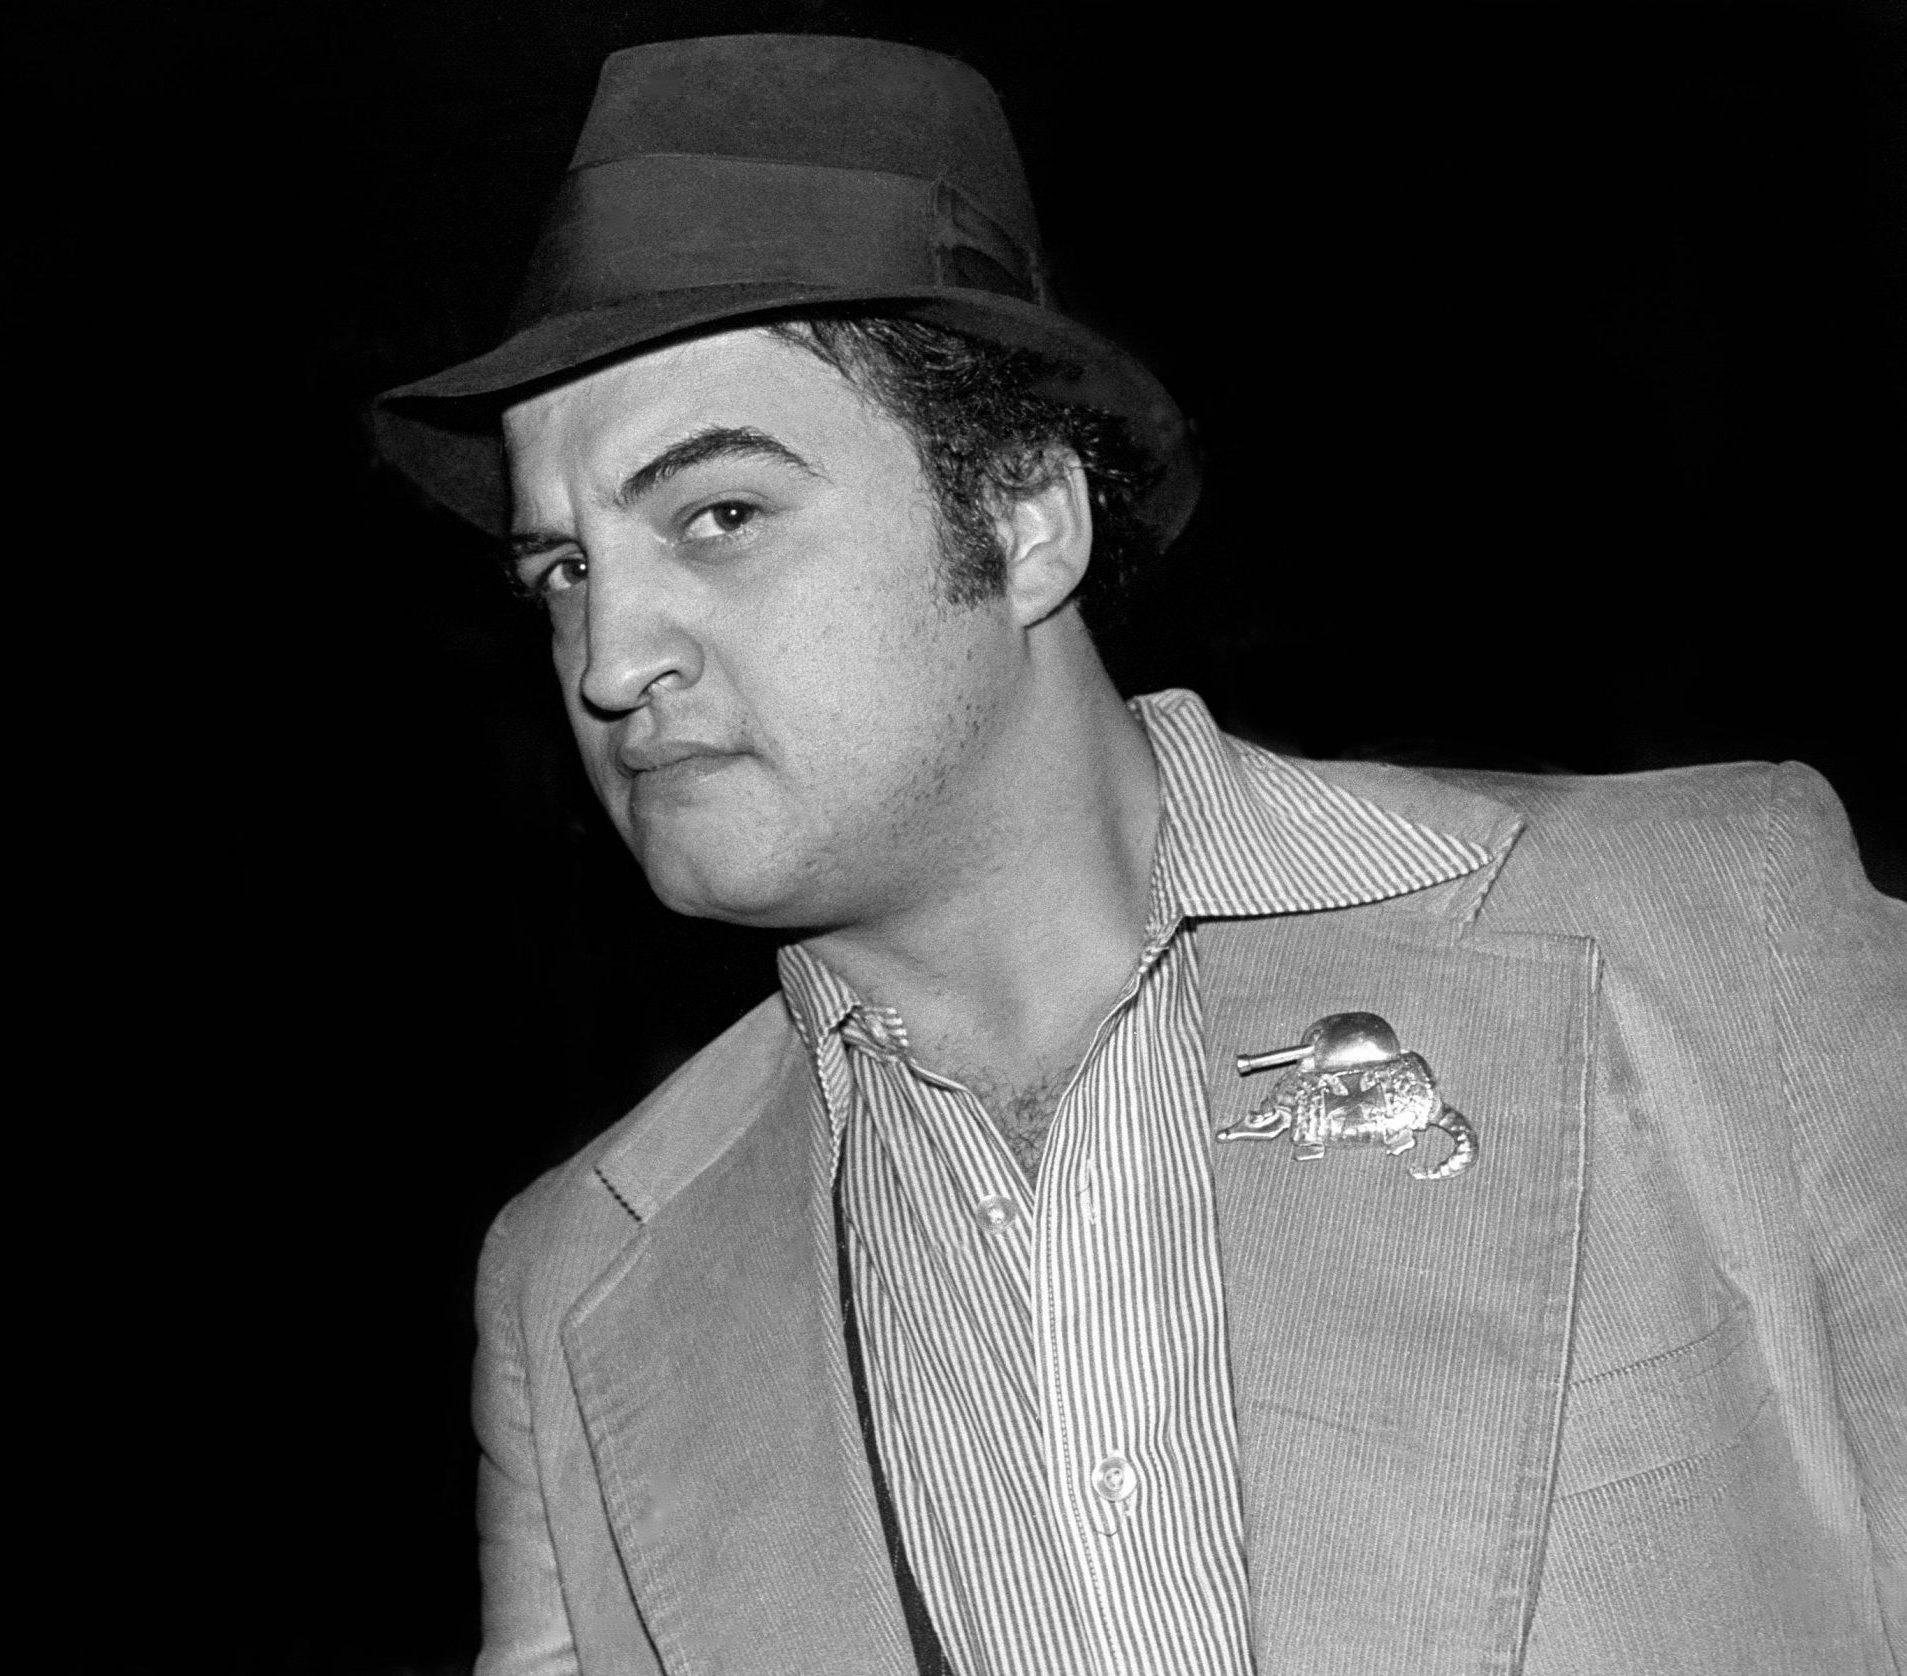 https www.biography.com .image MTY0MjAwMzk1OTQwMzA4MDk3 john belushi portrait of john belushi photo by richard e aaronredferns scaled e1608207941937 20 Things You May Have Missed In Ghostbusters